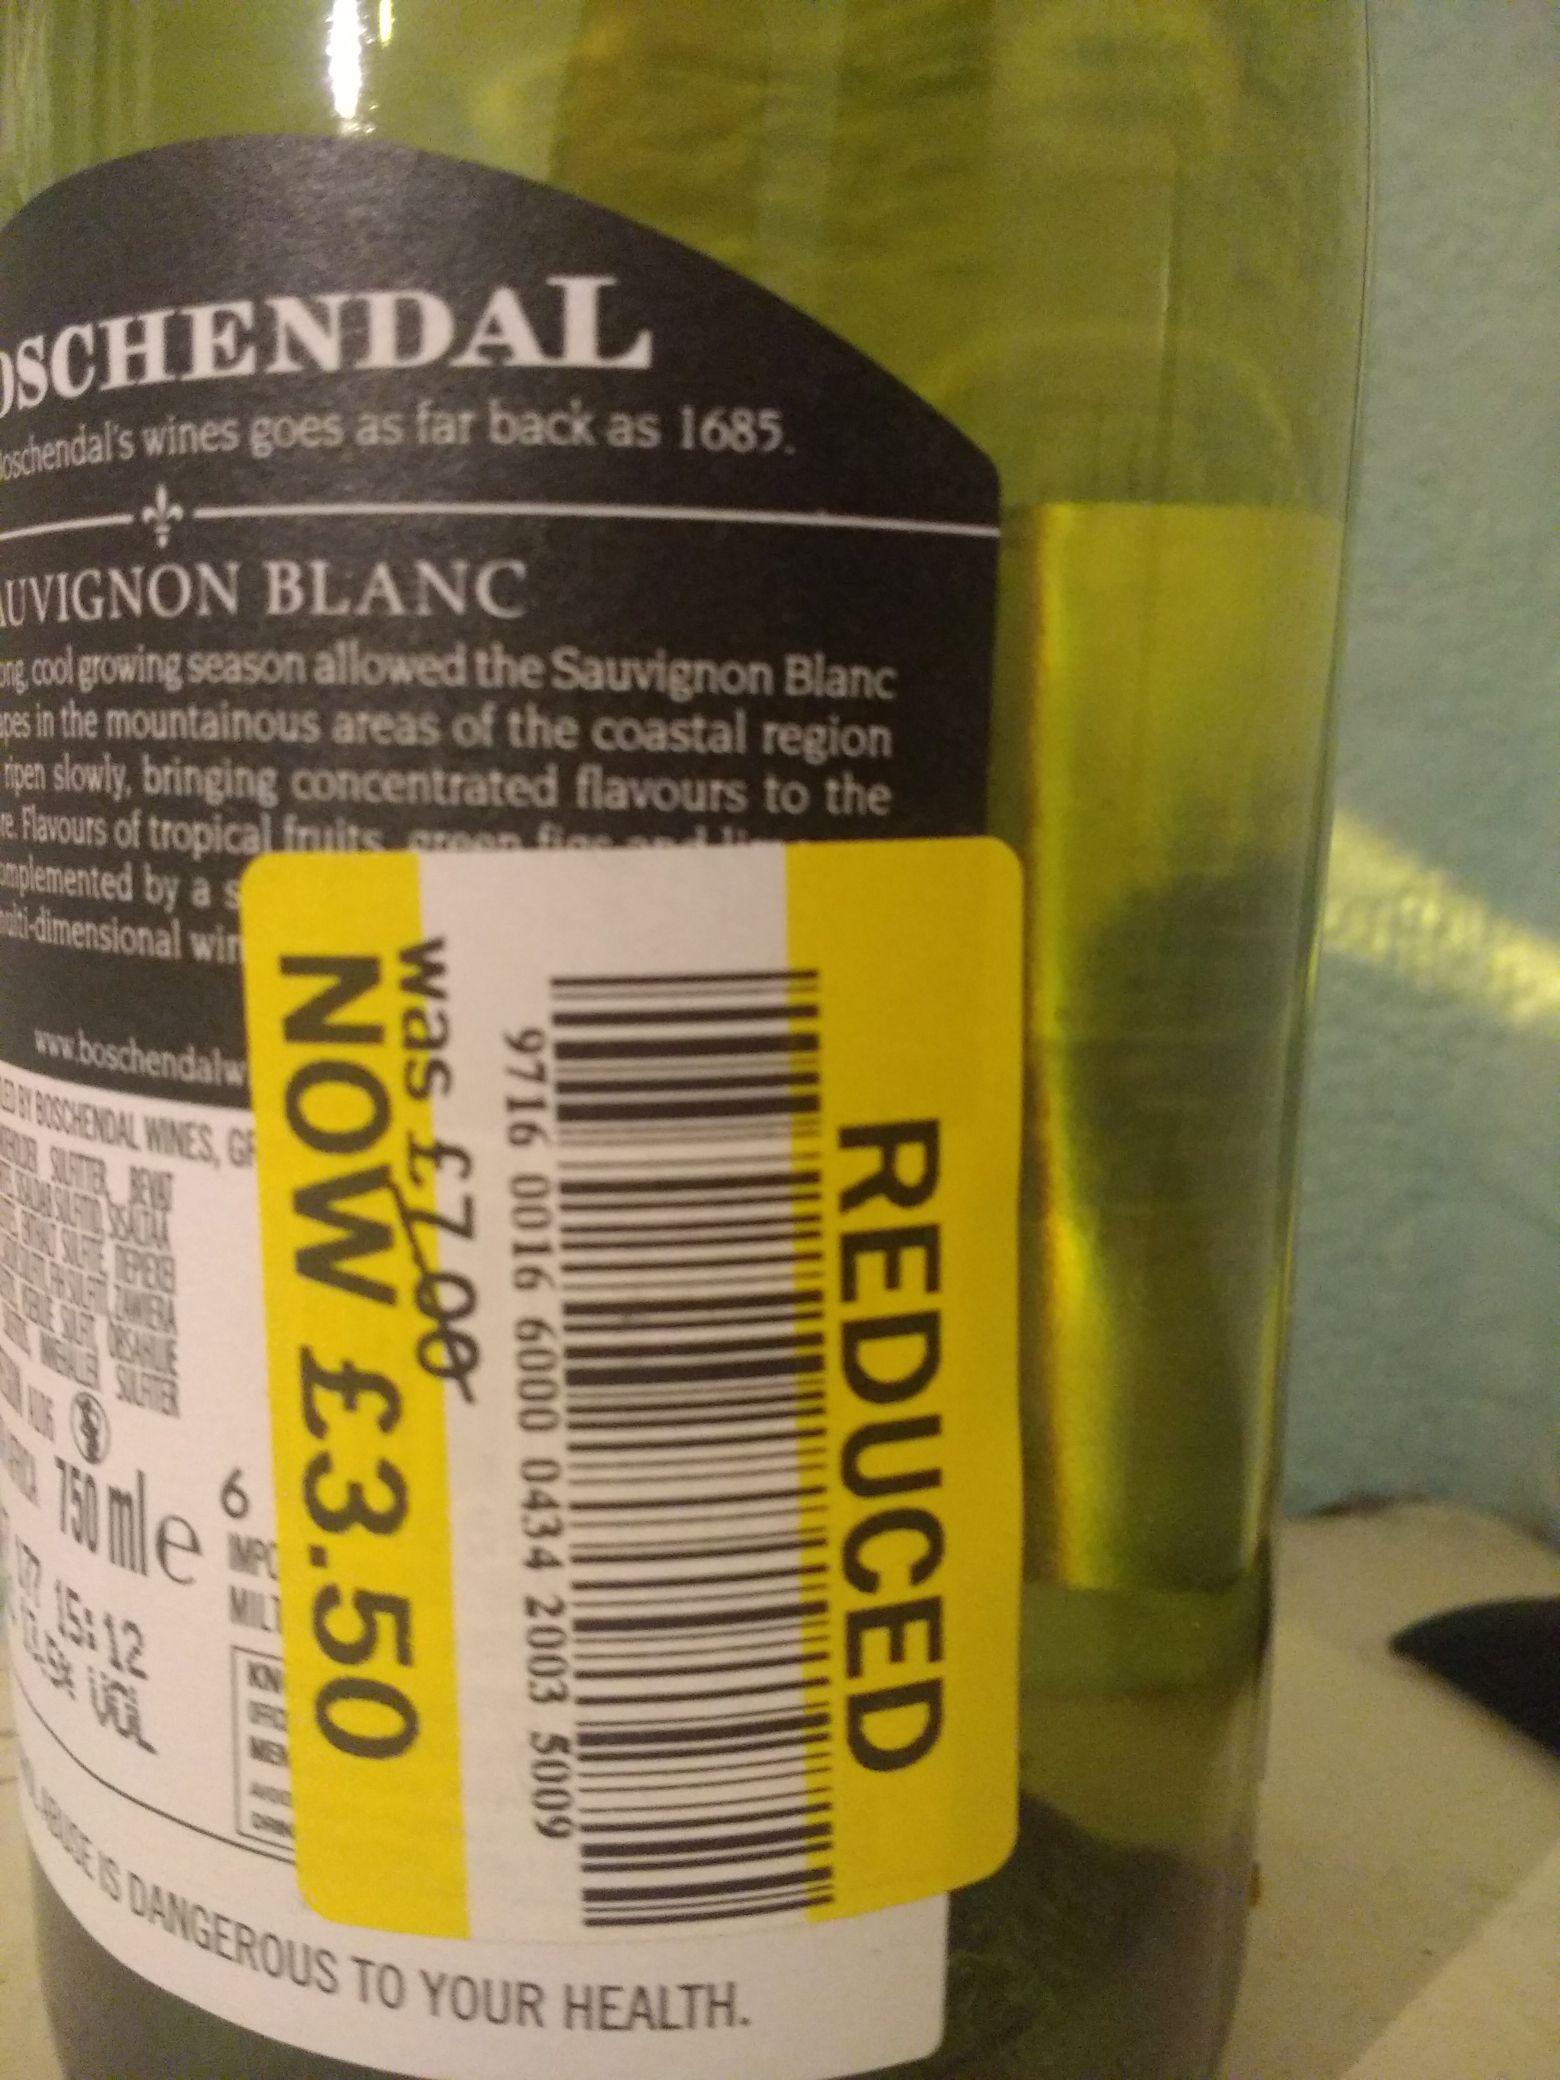 Wines RTC Tesco instore (Feltham High Street) eg - Boschendal Sauvignon Blanc - £3.50